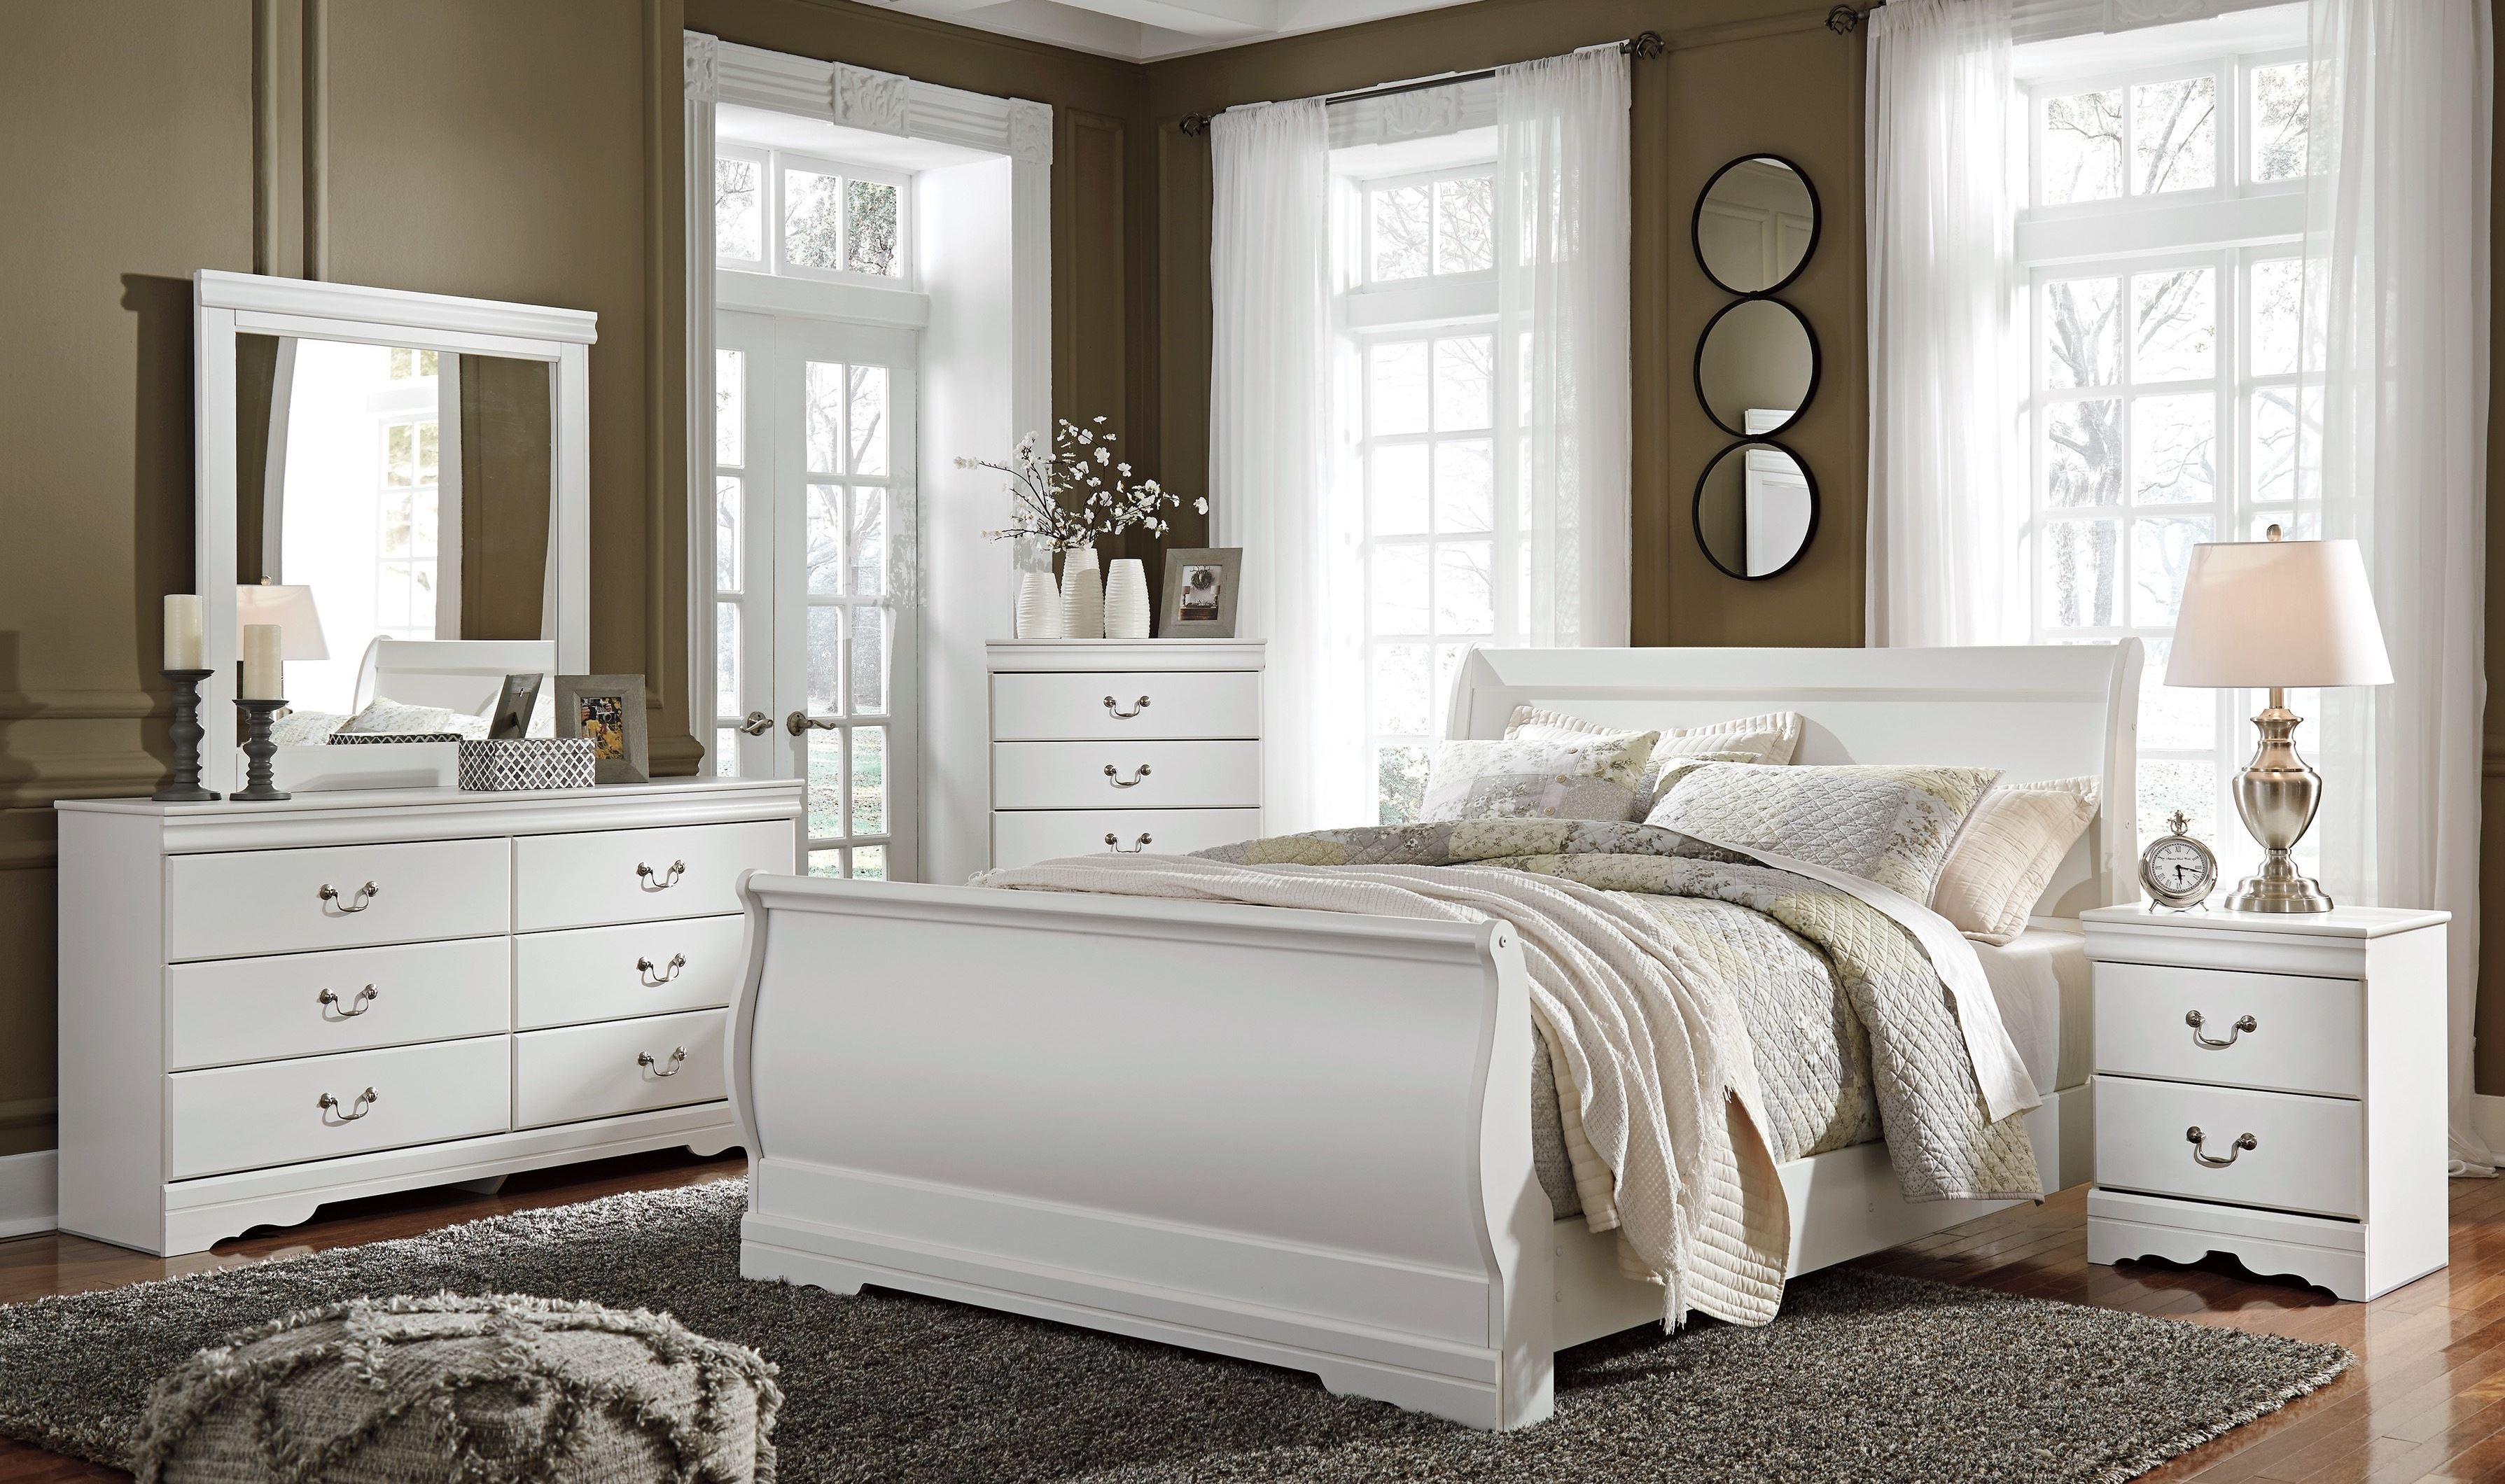 Signature Design by Ashley Anarasia White Youth Sleigh Bedroom Set ...